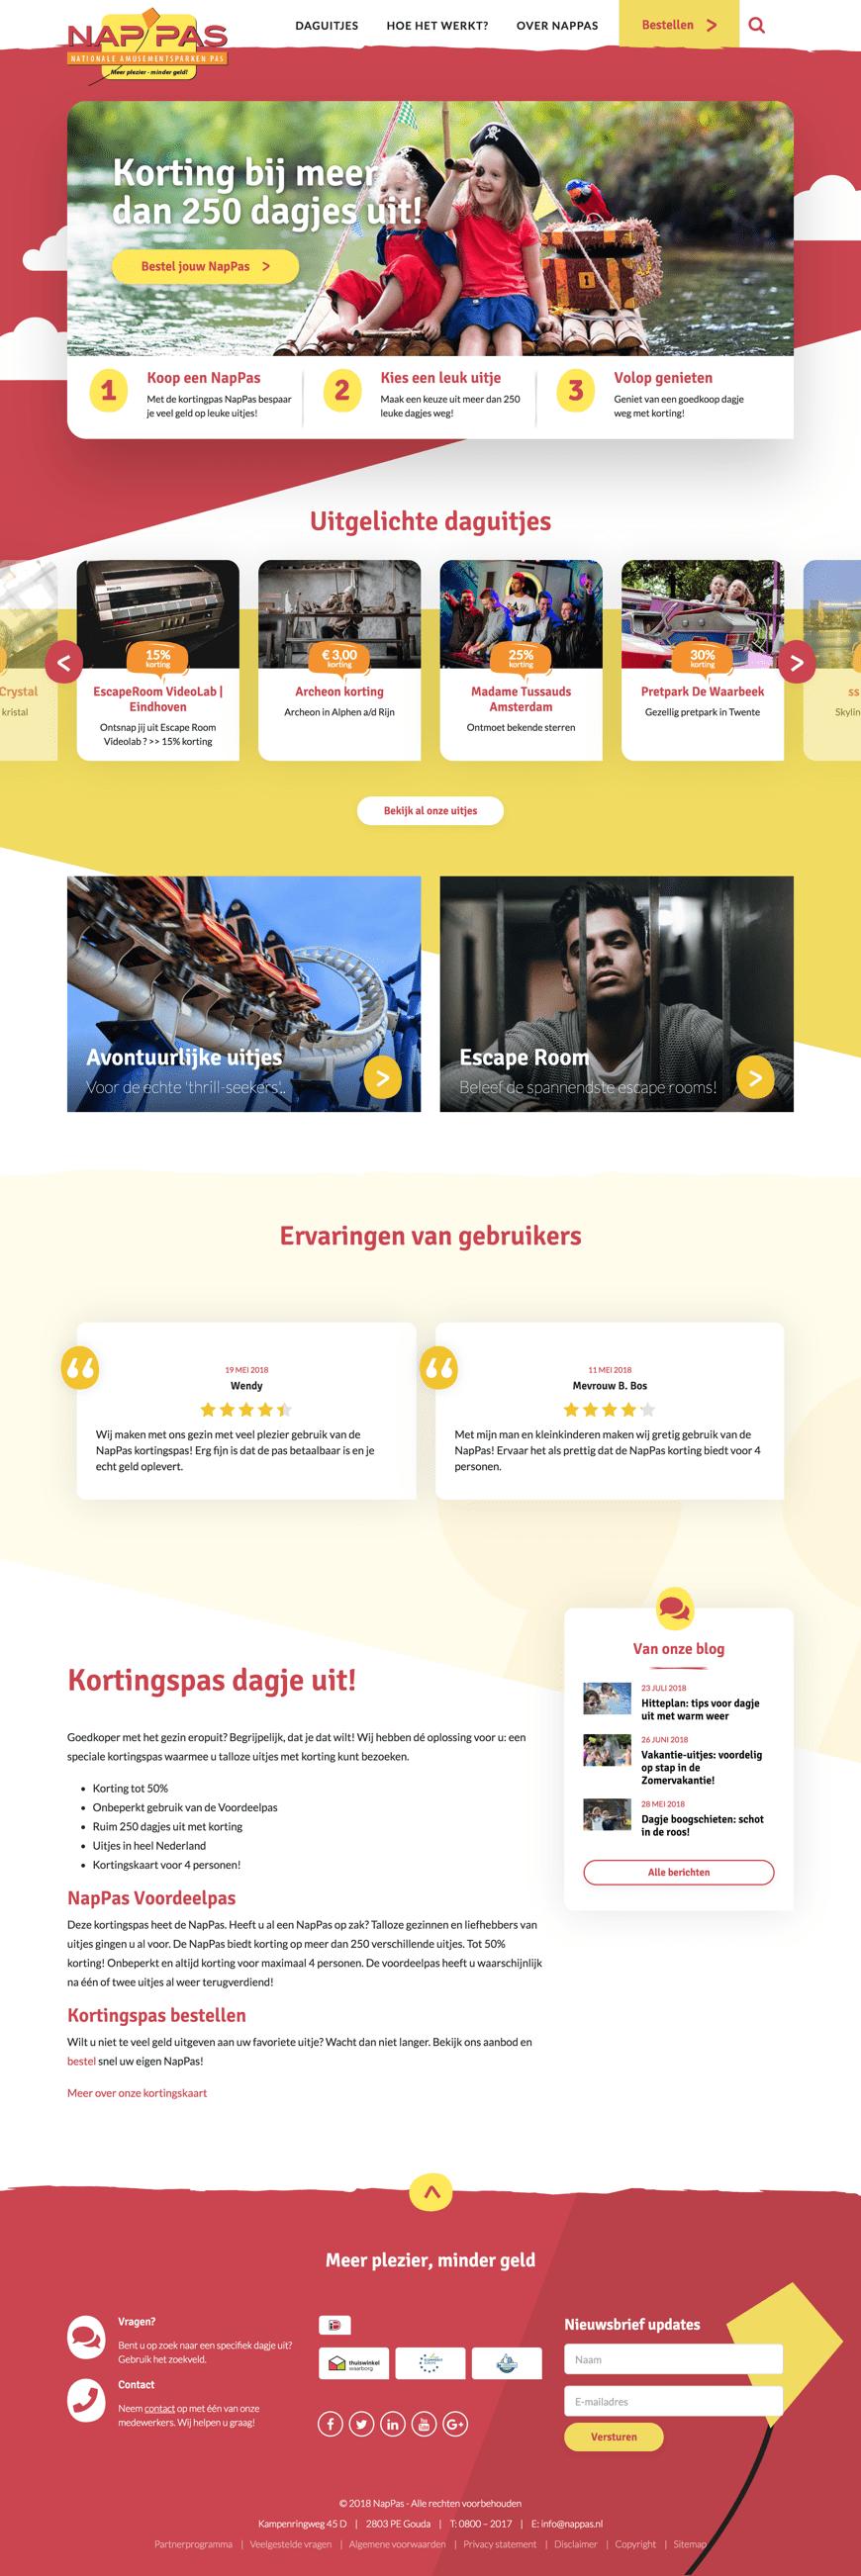 www.nappas.nl